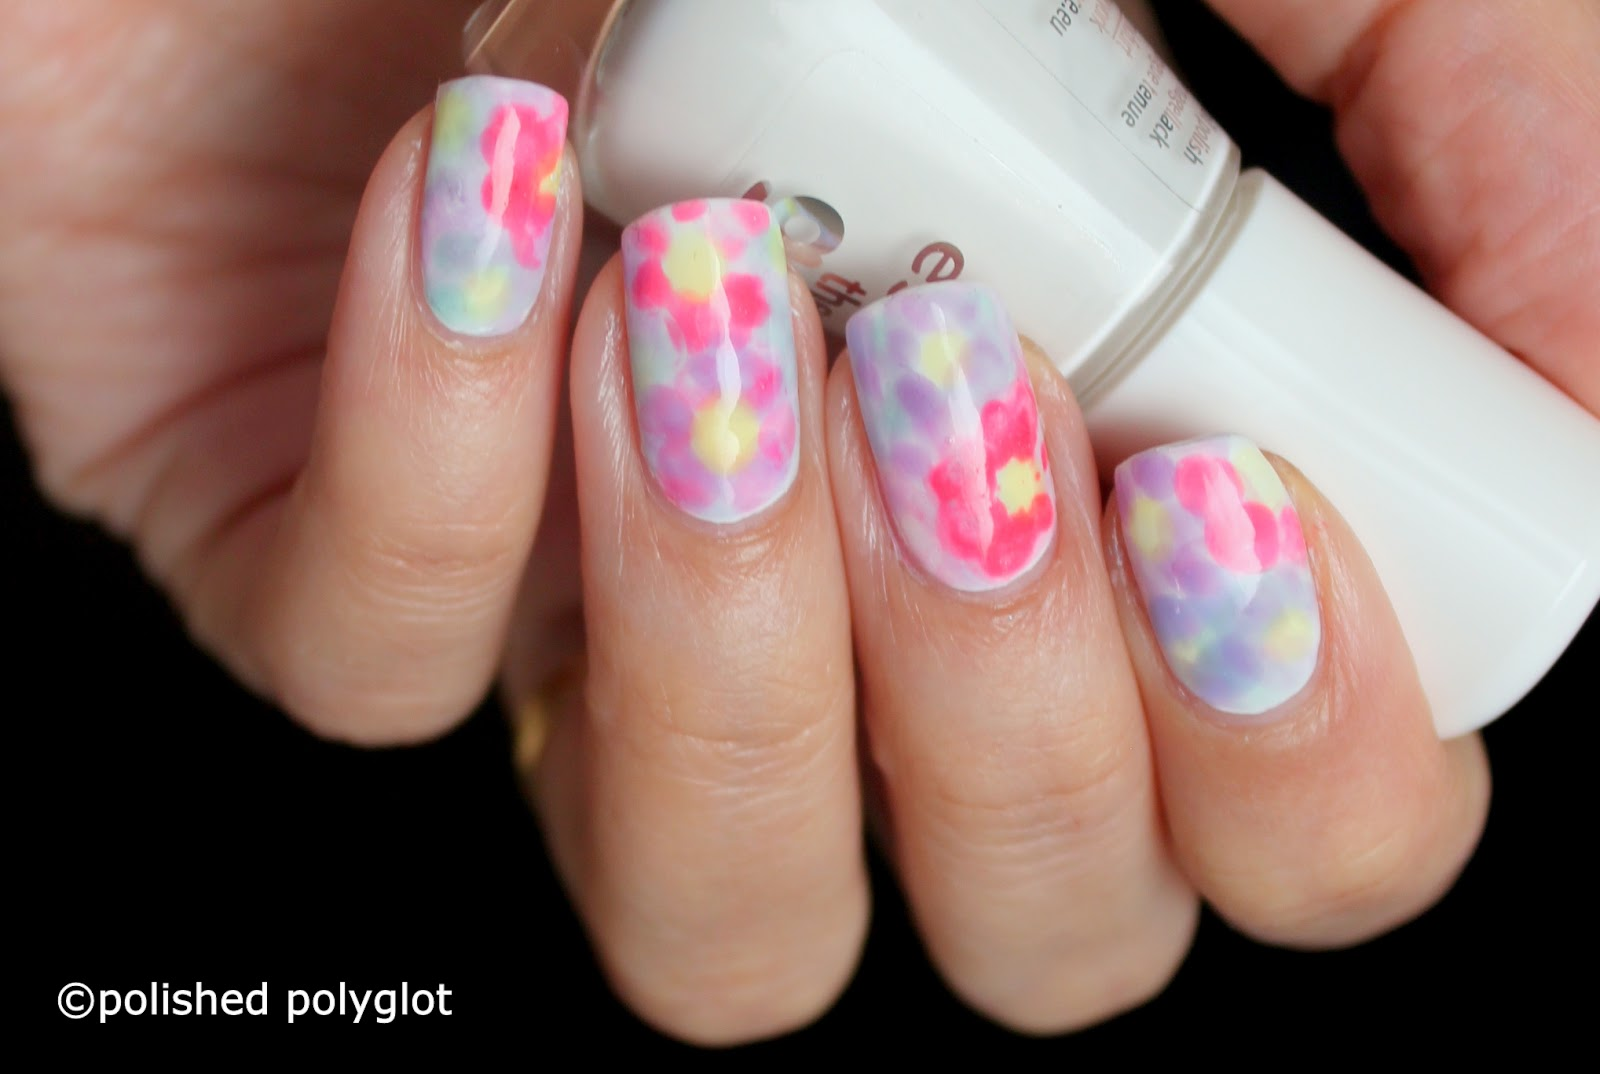 Nail flower designs do it yourself best flower 2017 how to paint simple cute fl sencilla flower nail art mani solutioingenieria Choice Image